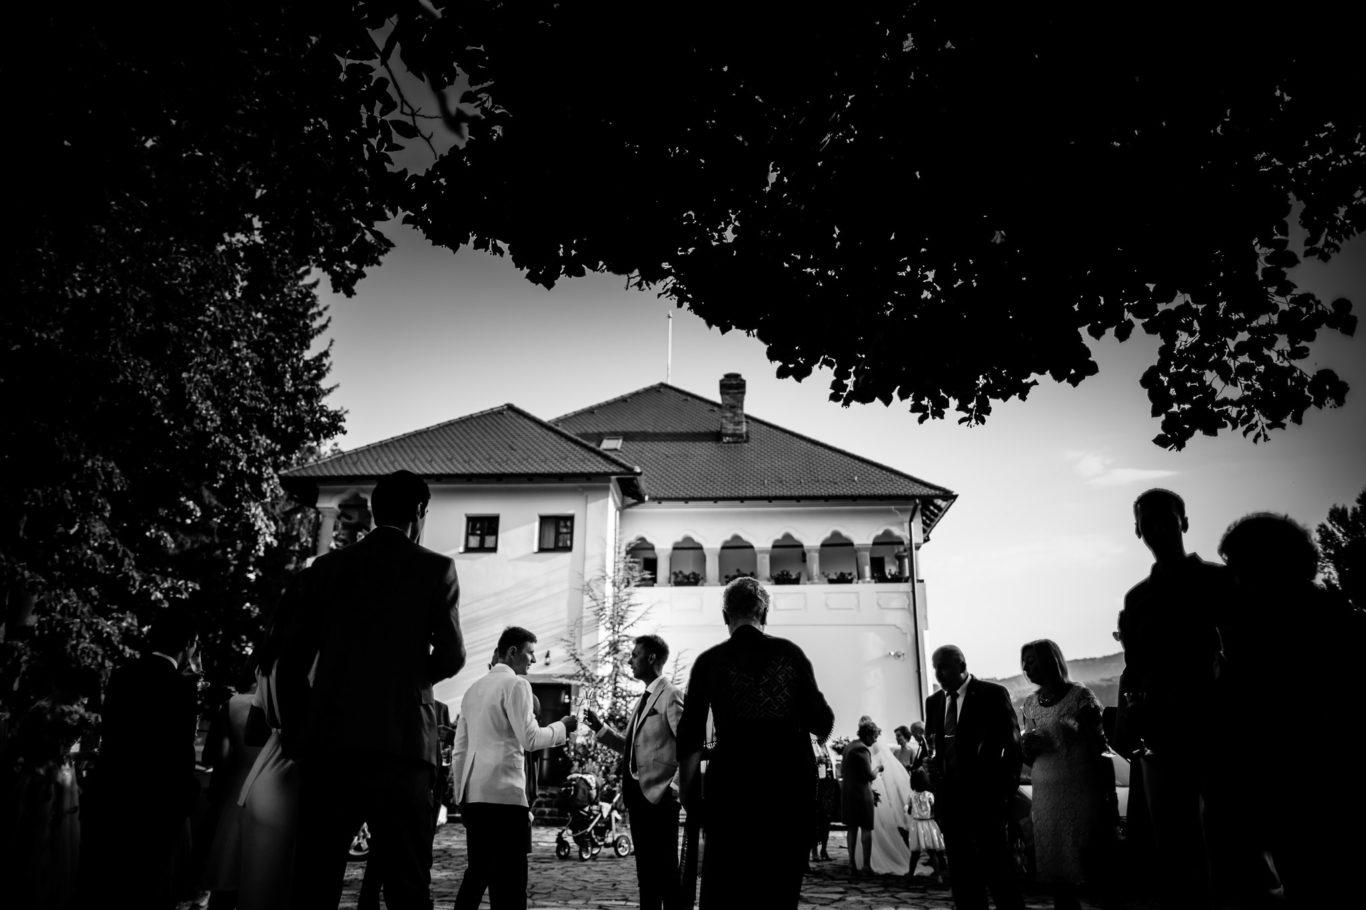 0404-fotoreportaj-nunta-conacul-maldar-cristina-stefan-fotograf-ciprian-dumitrescu-dc1_2582